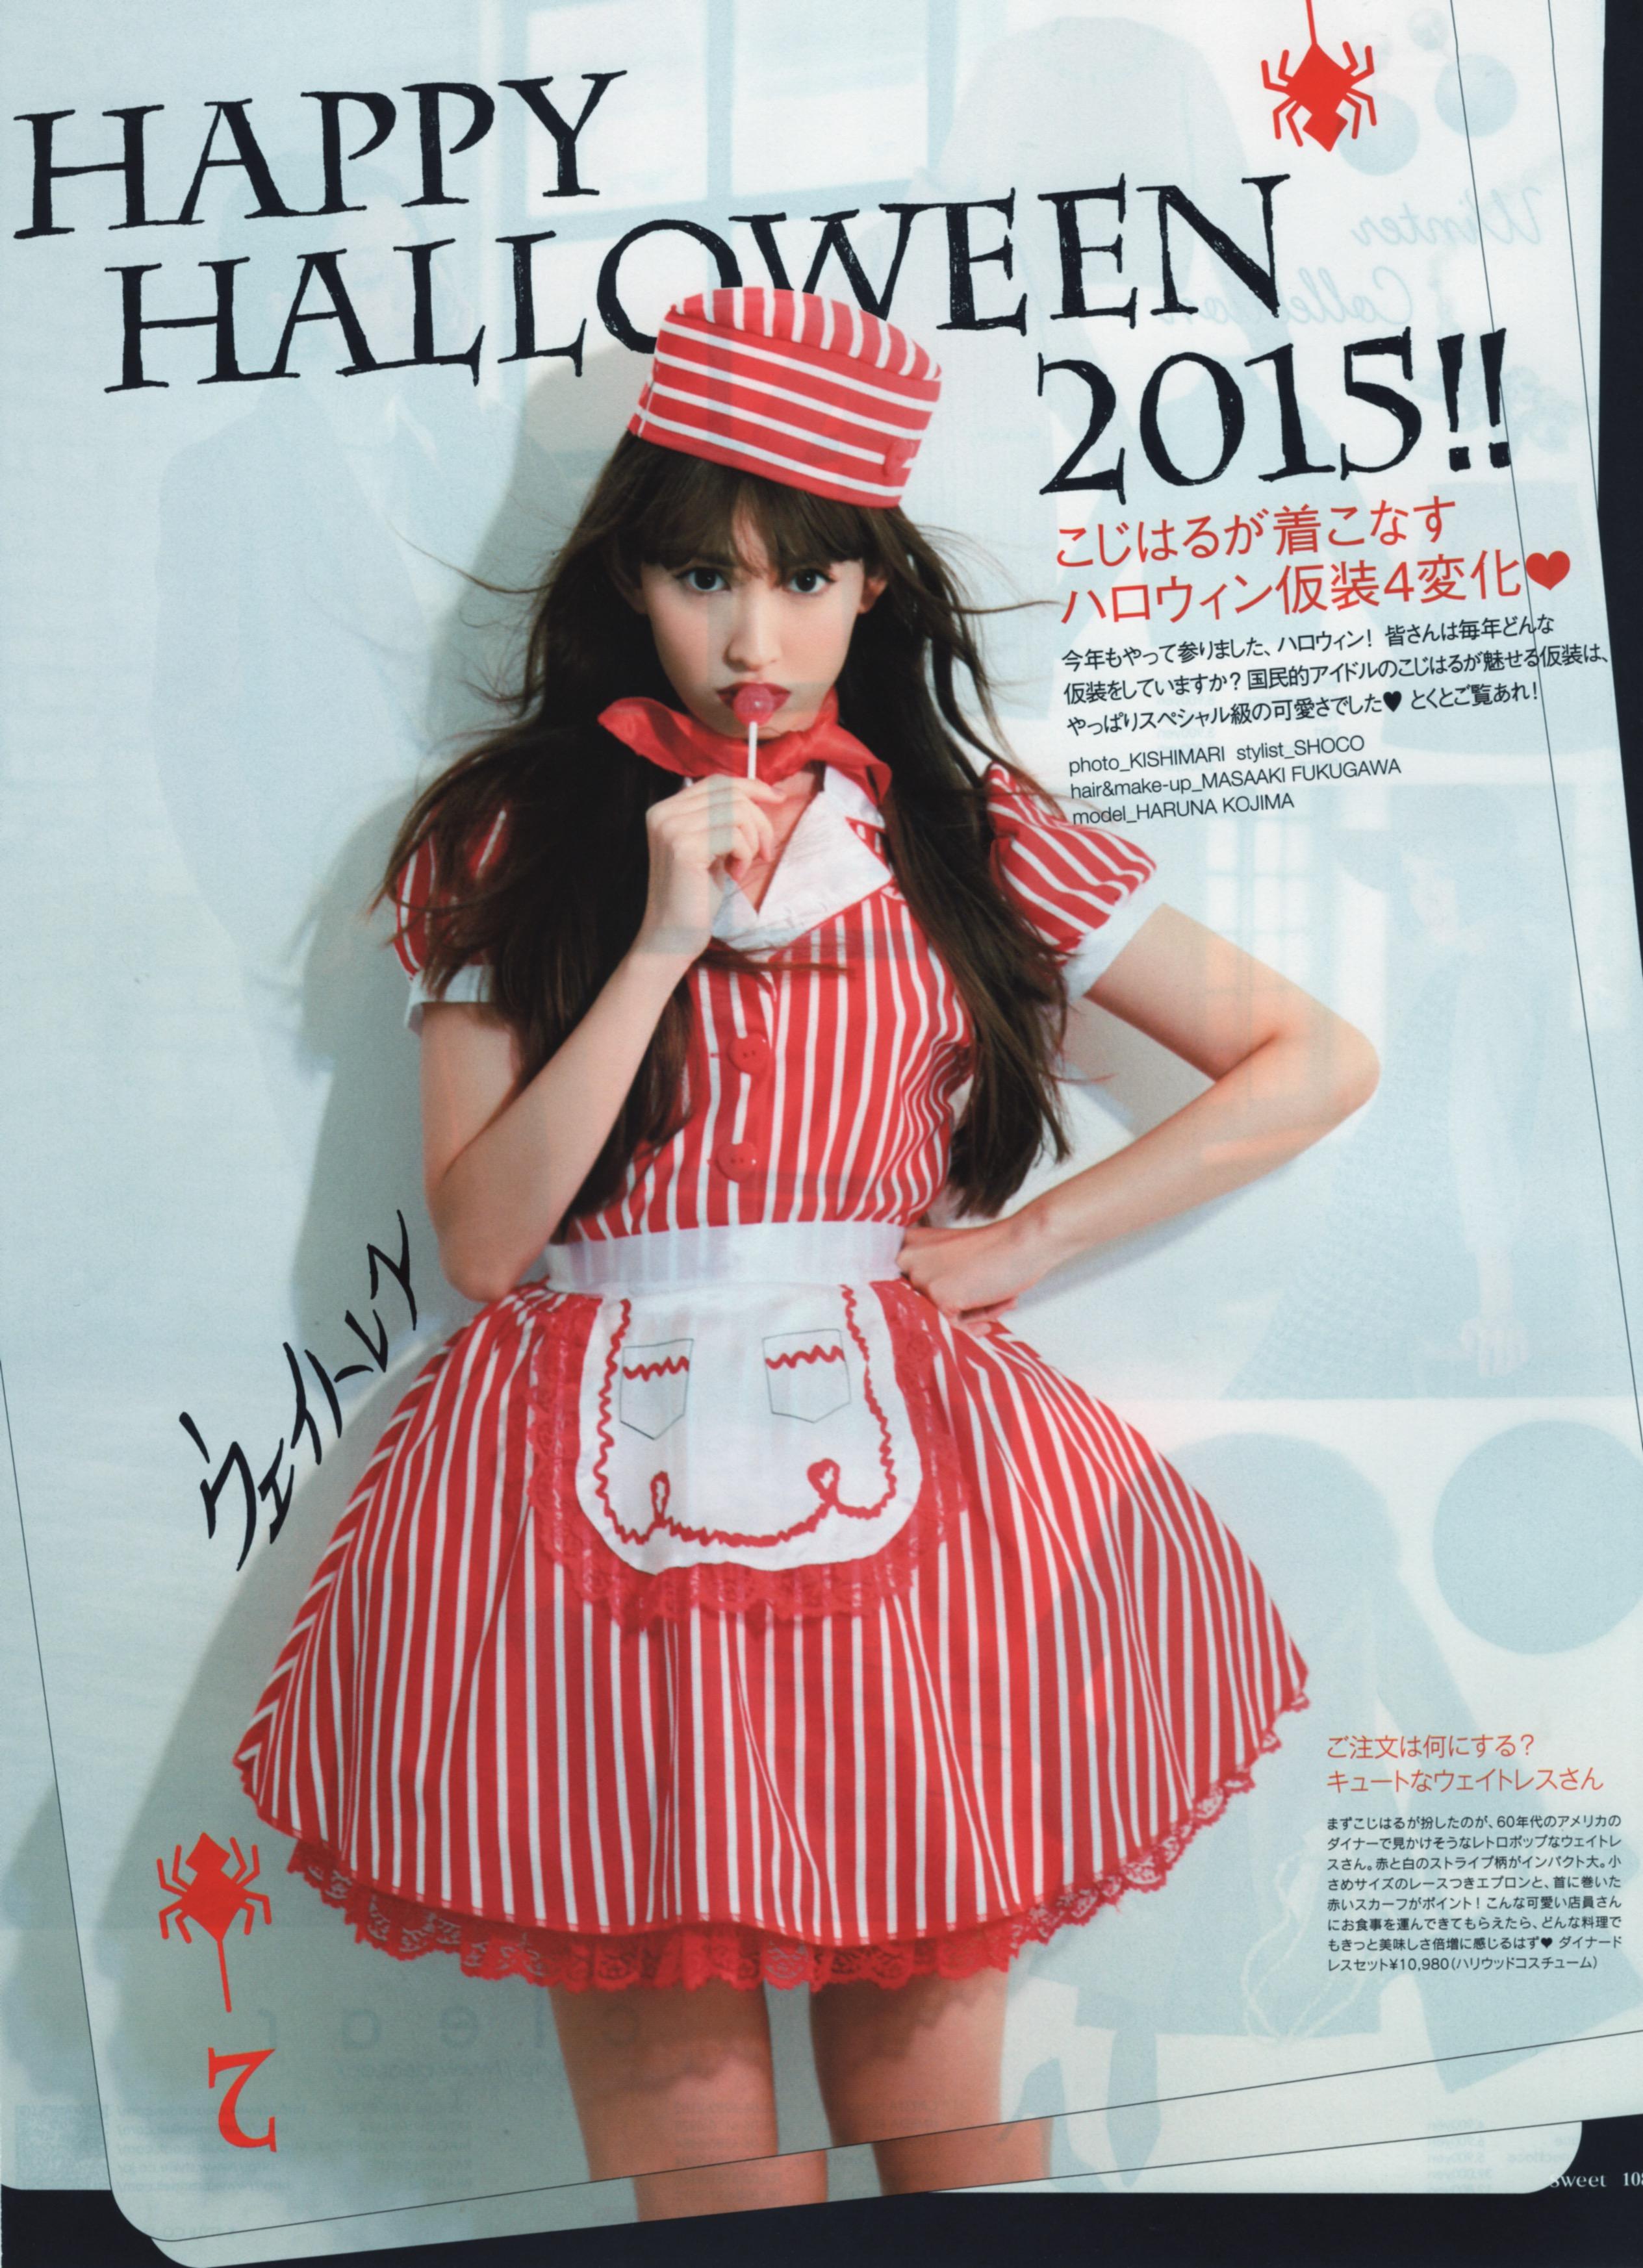 SWEET 2015 nov  小嶋陽菜 halloween